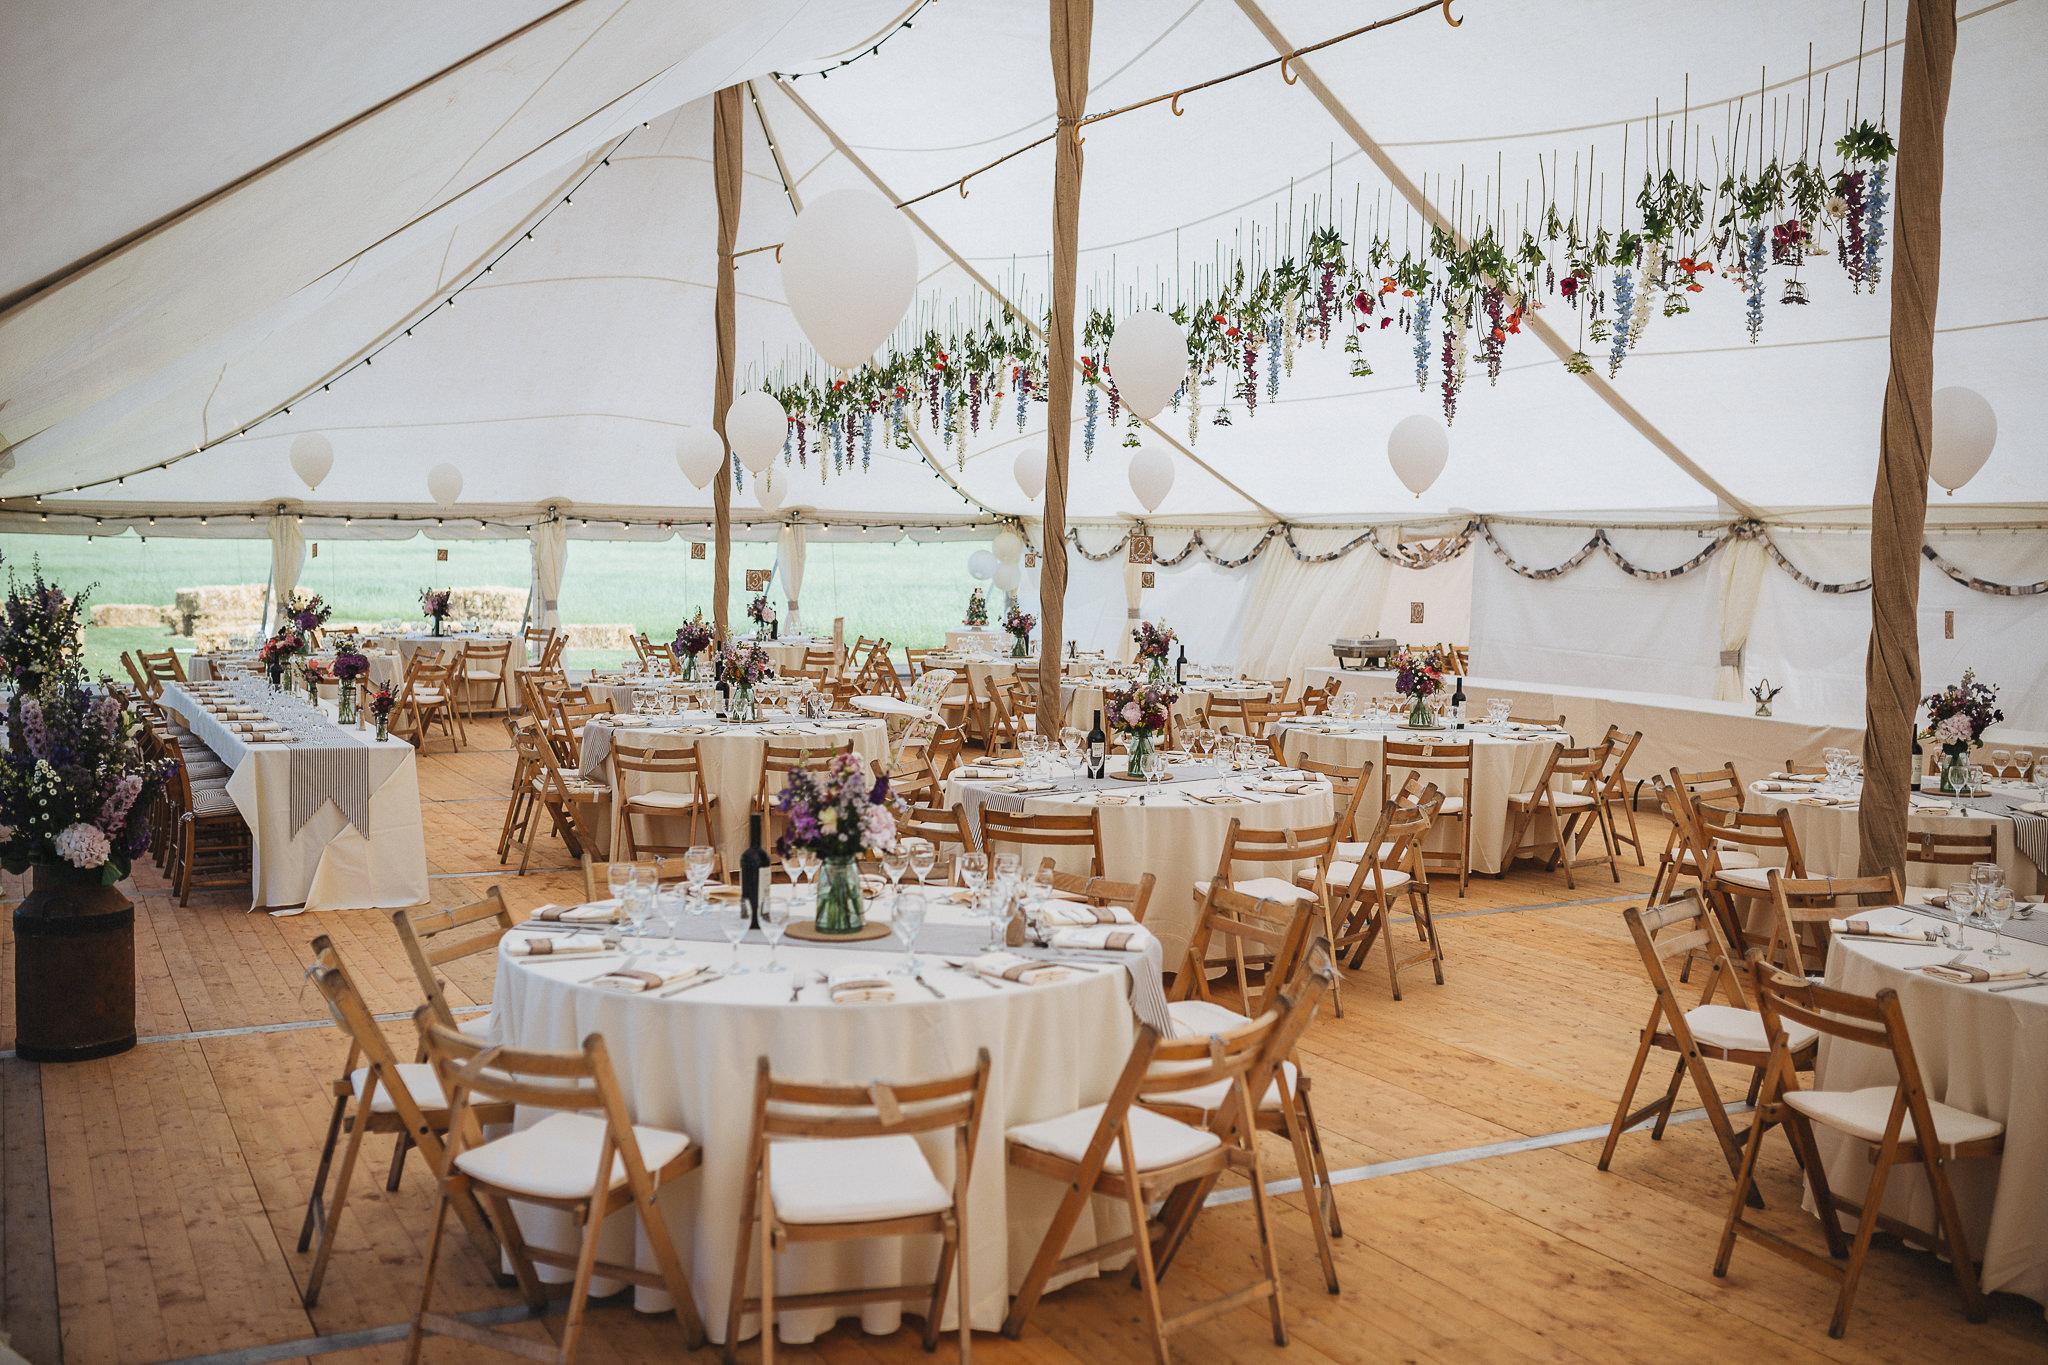 paul-marbrook-Farm-Wedding-Photographer-Lancashire-90045